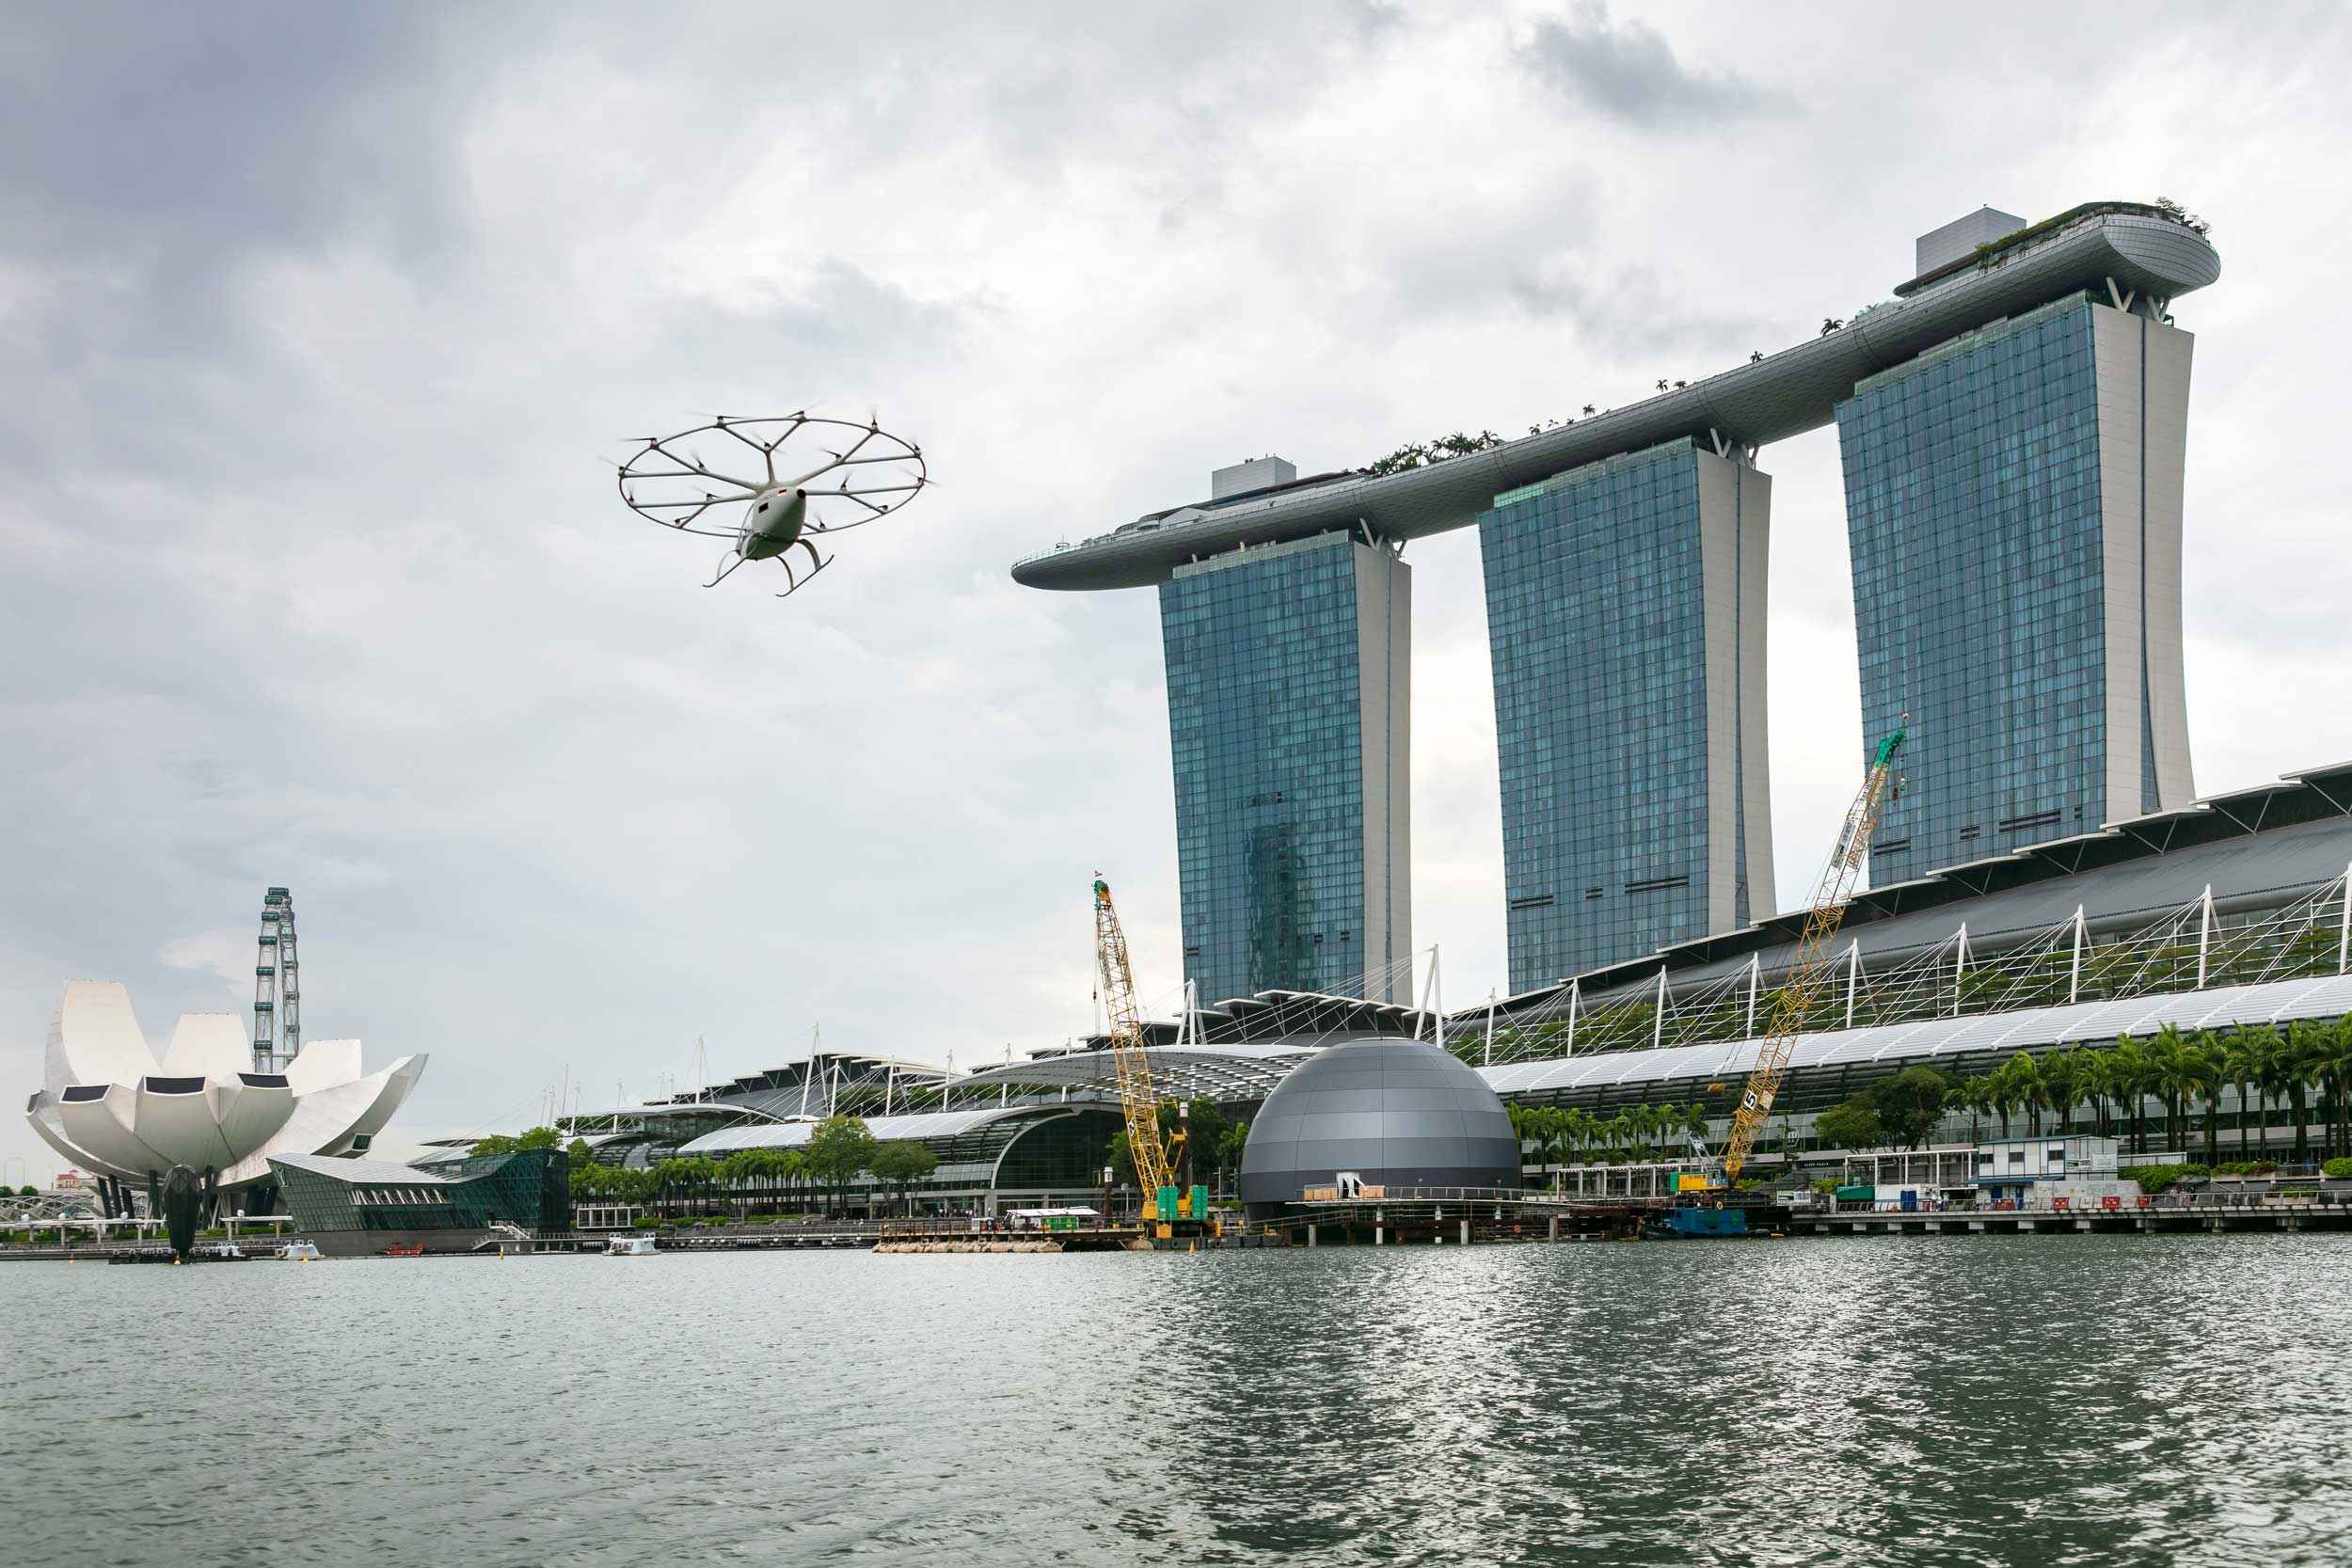 Volocopter Singapore